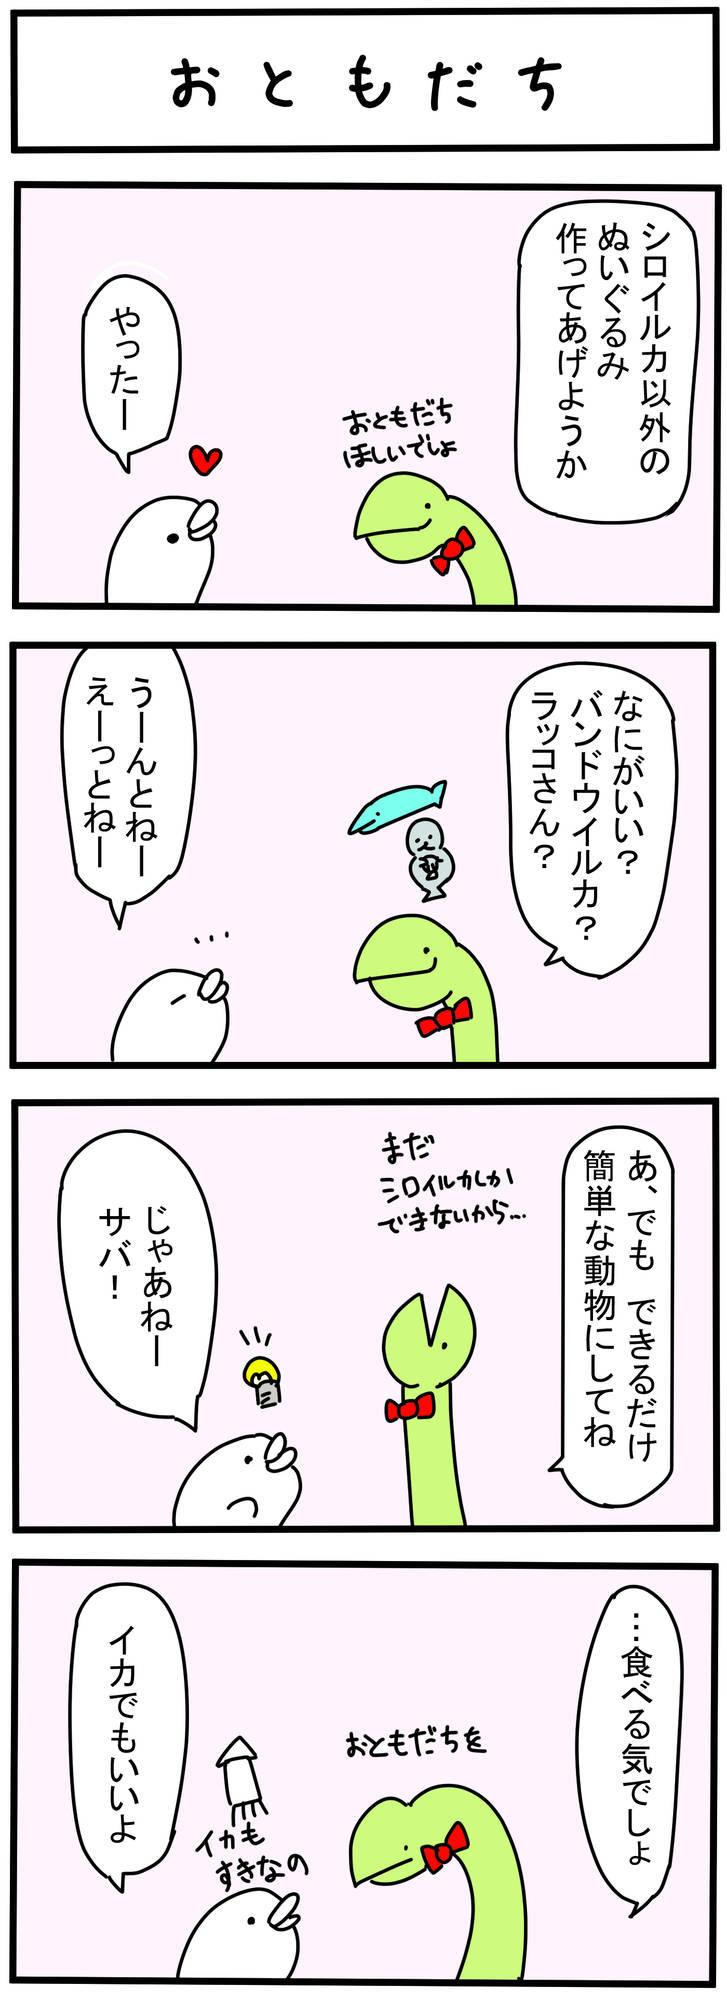 f:id:shiro_iruka:20190325214213j:plain